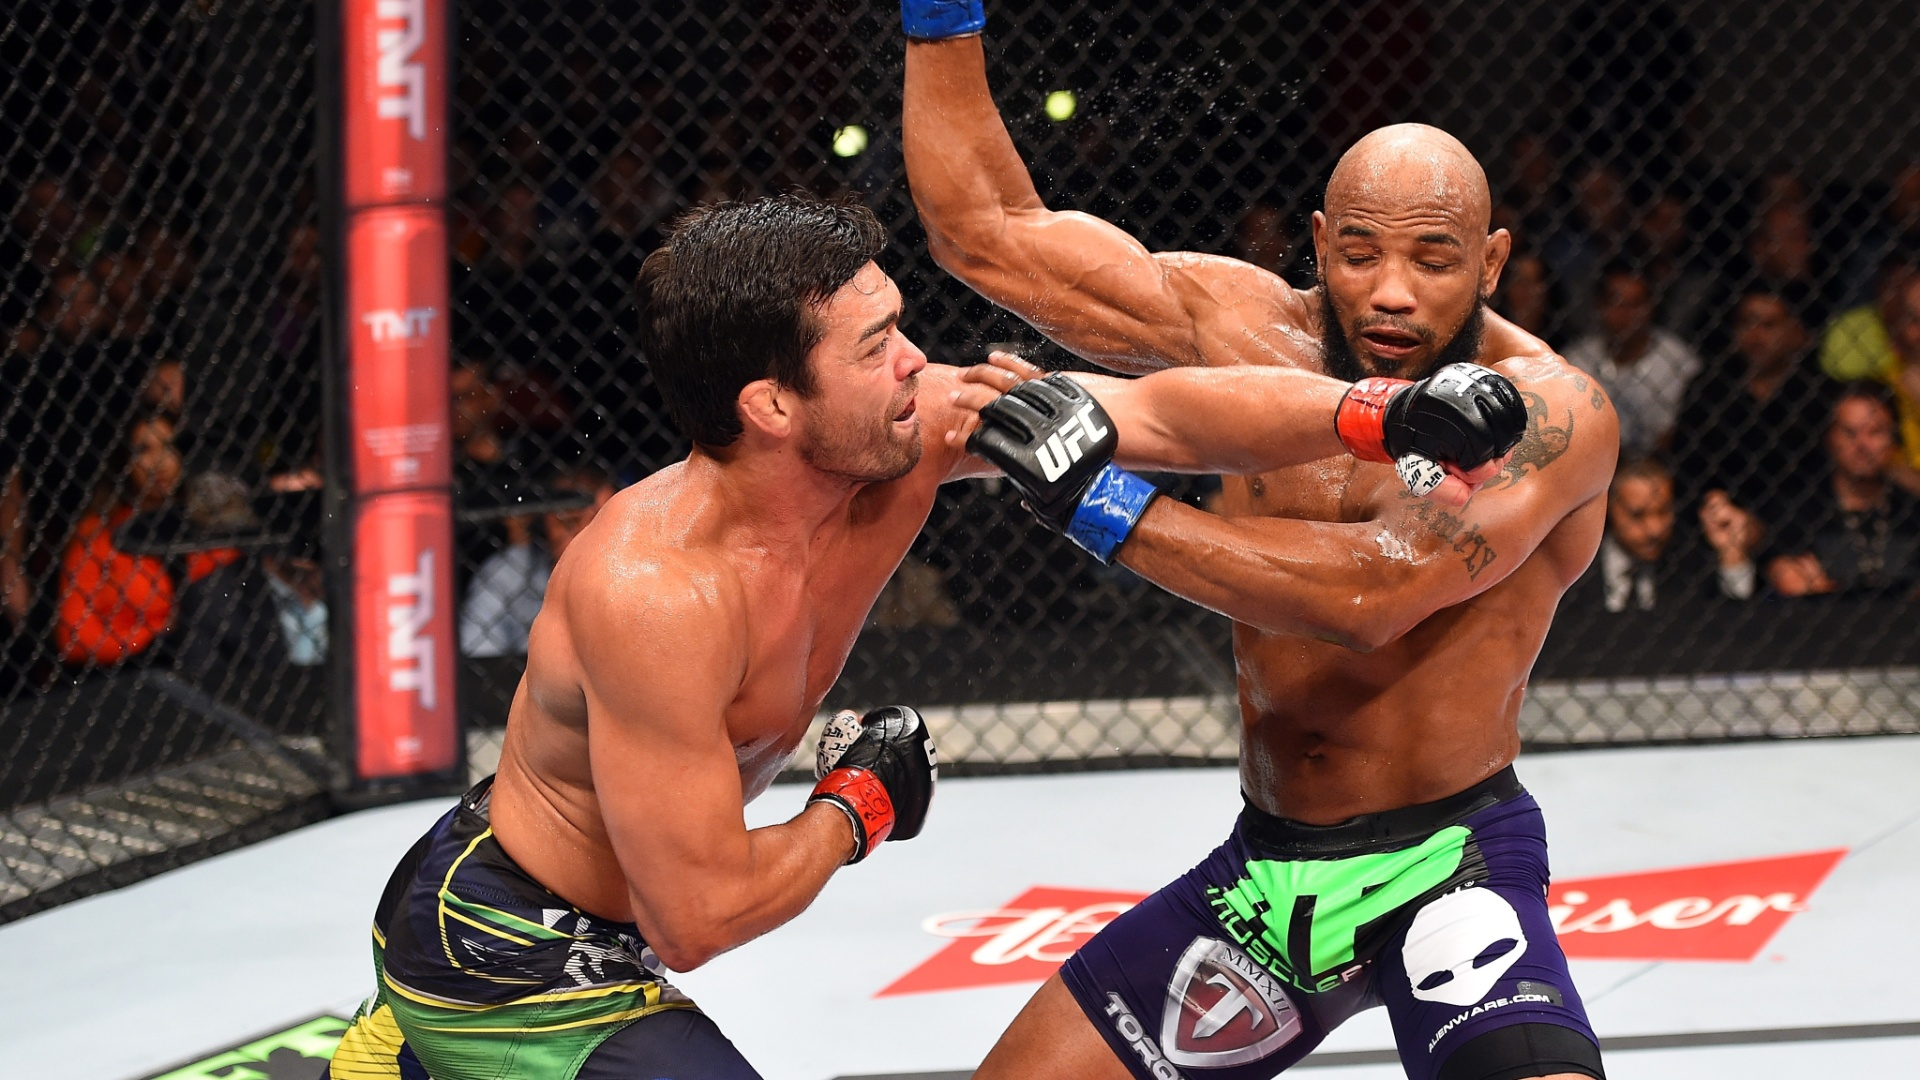 Lyoto Machida acerta Yoel Romero durante a derrota do brasileiro por nocaute no terceiro round